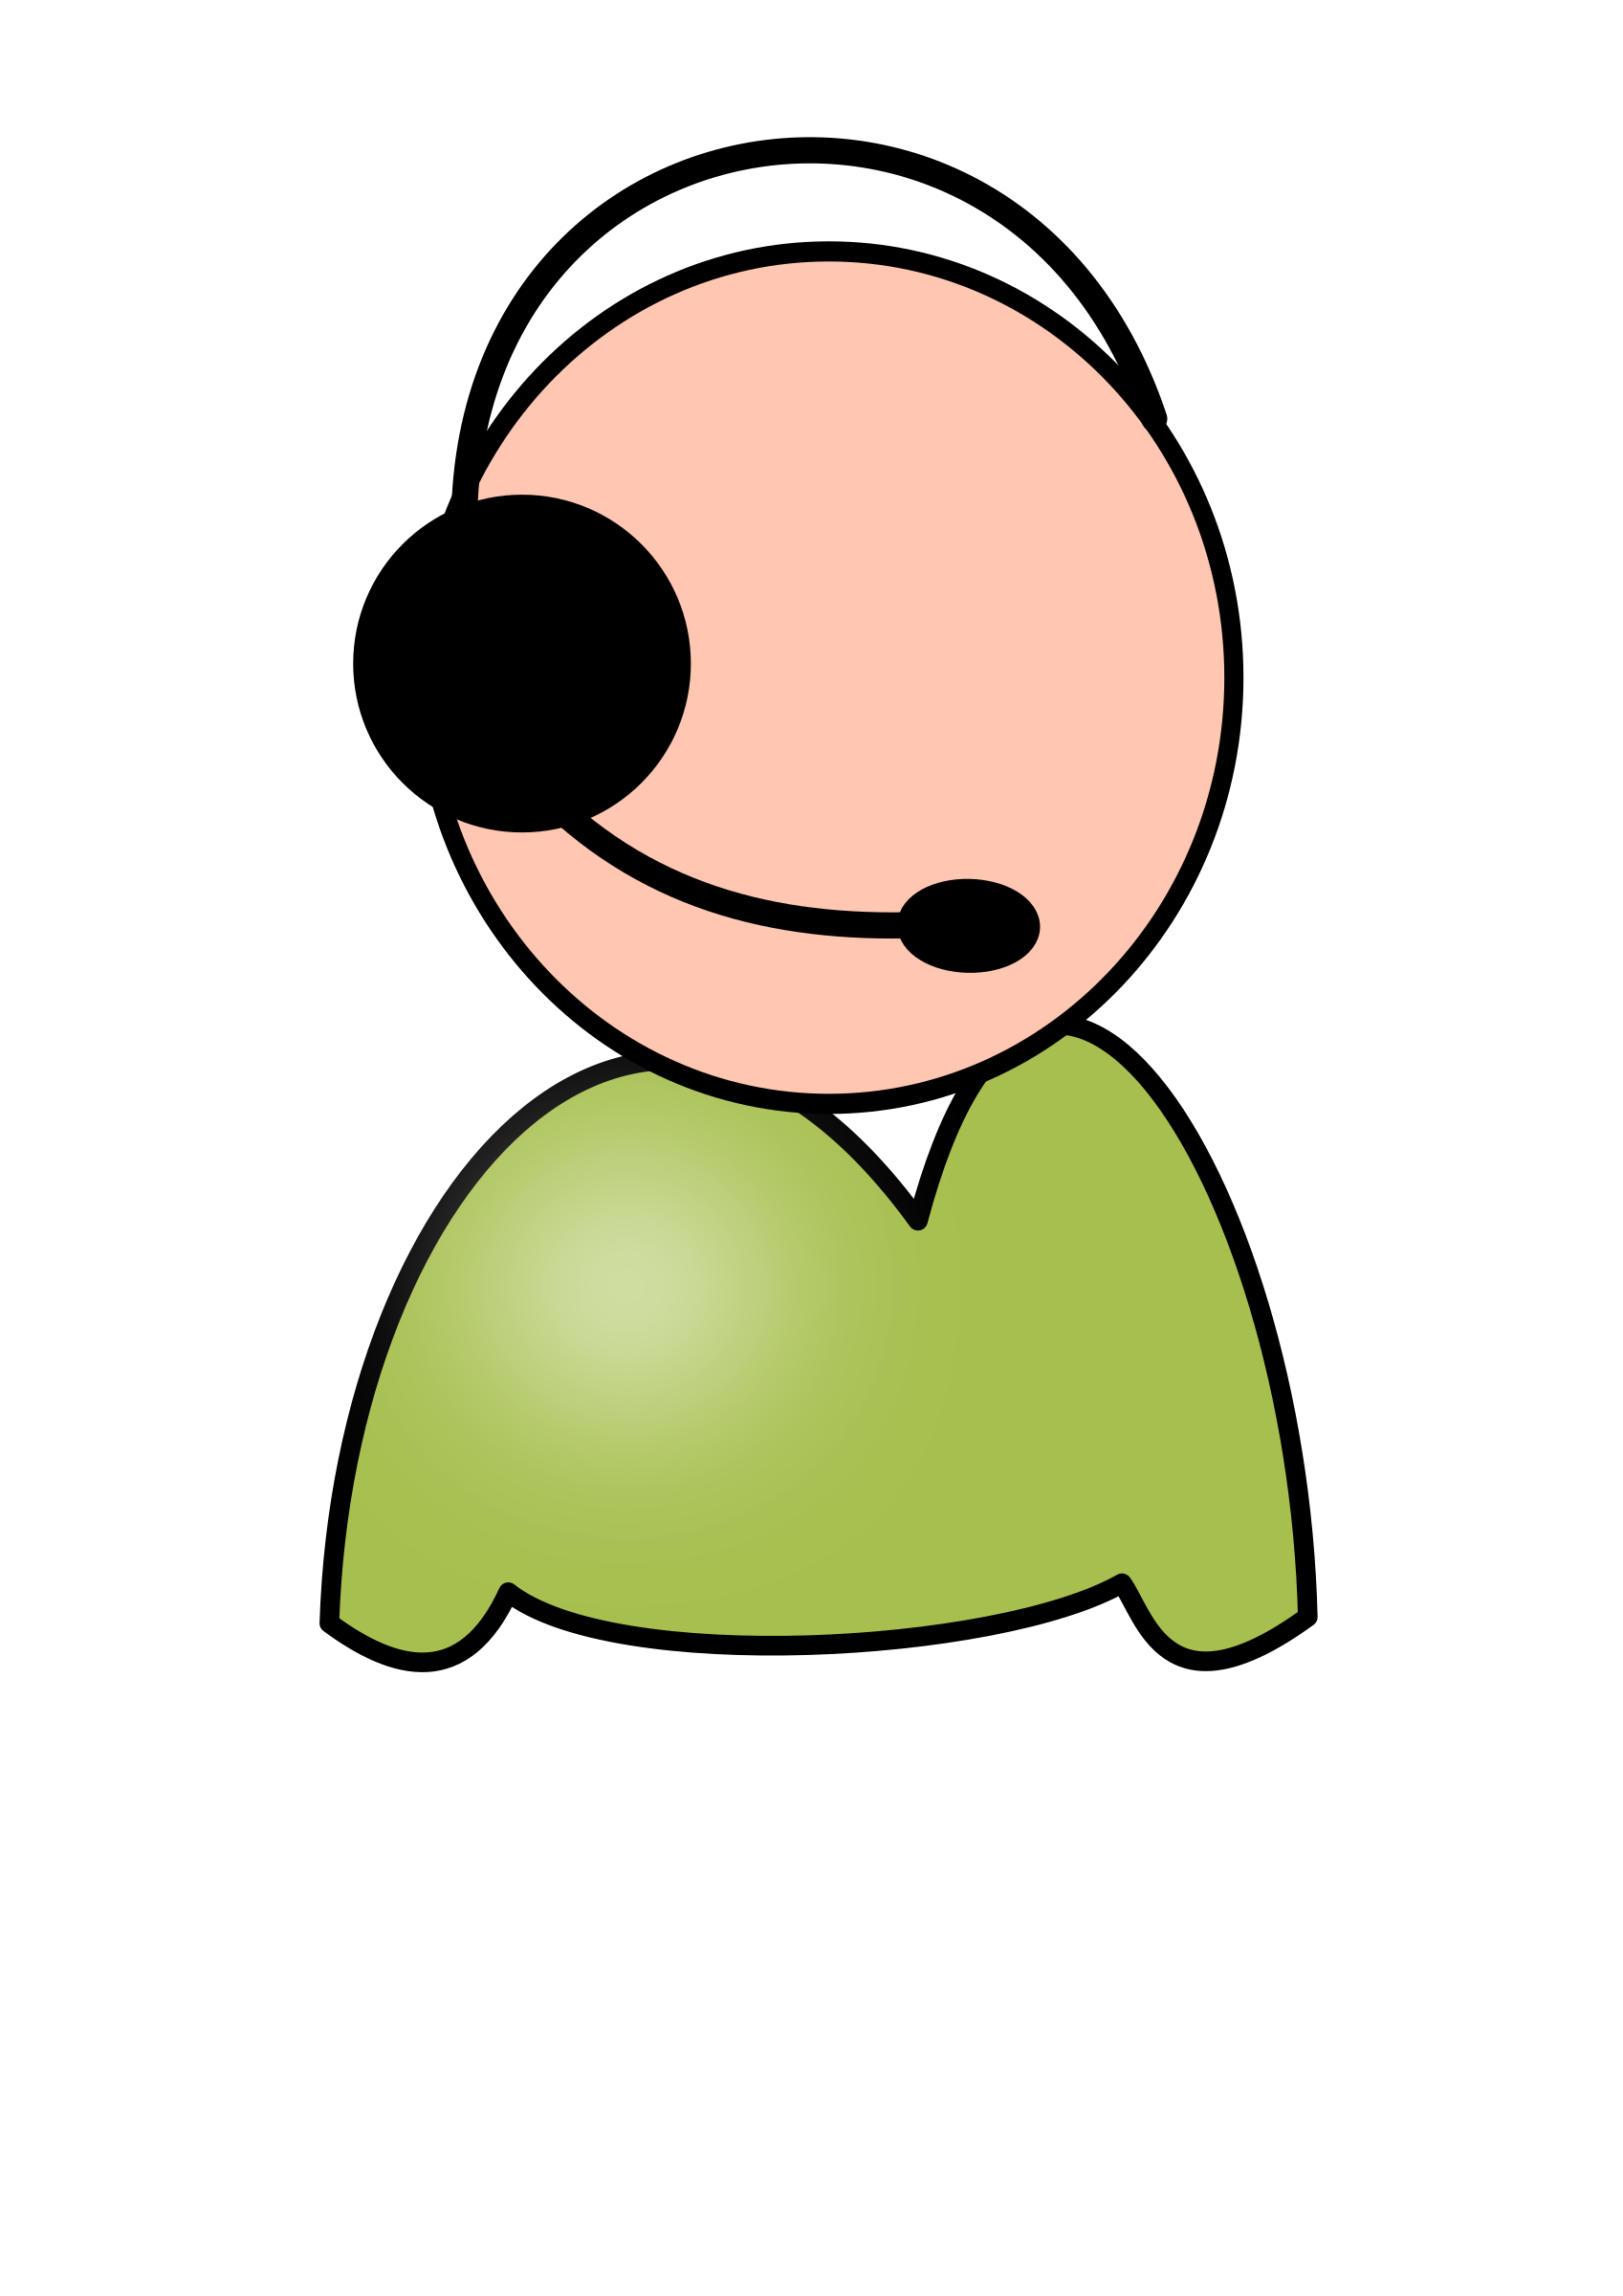 Servicedesk employee big image. Desk clipart head